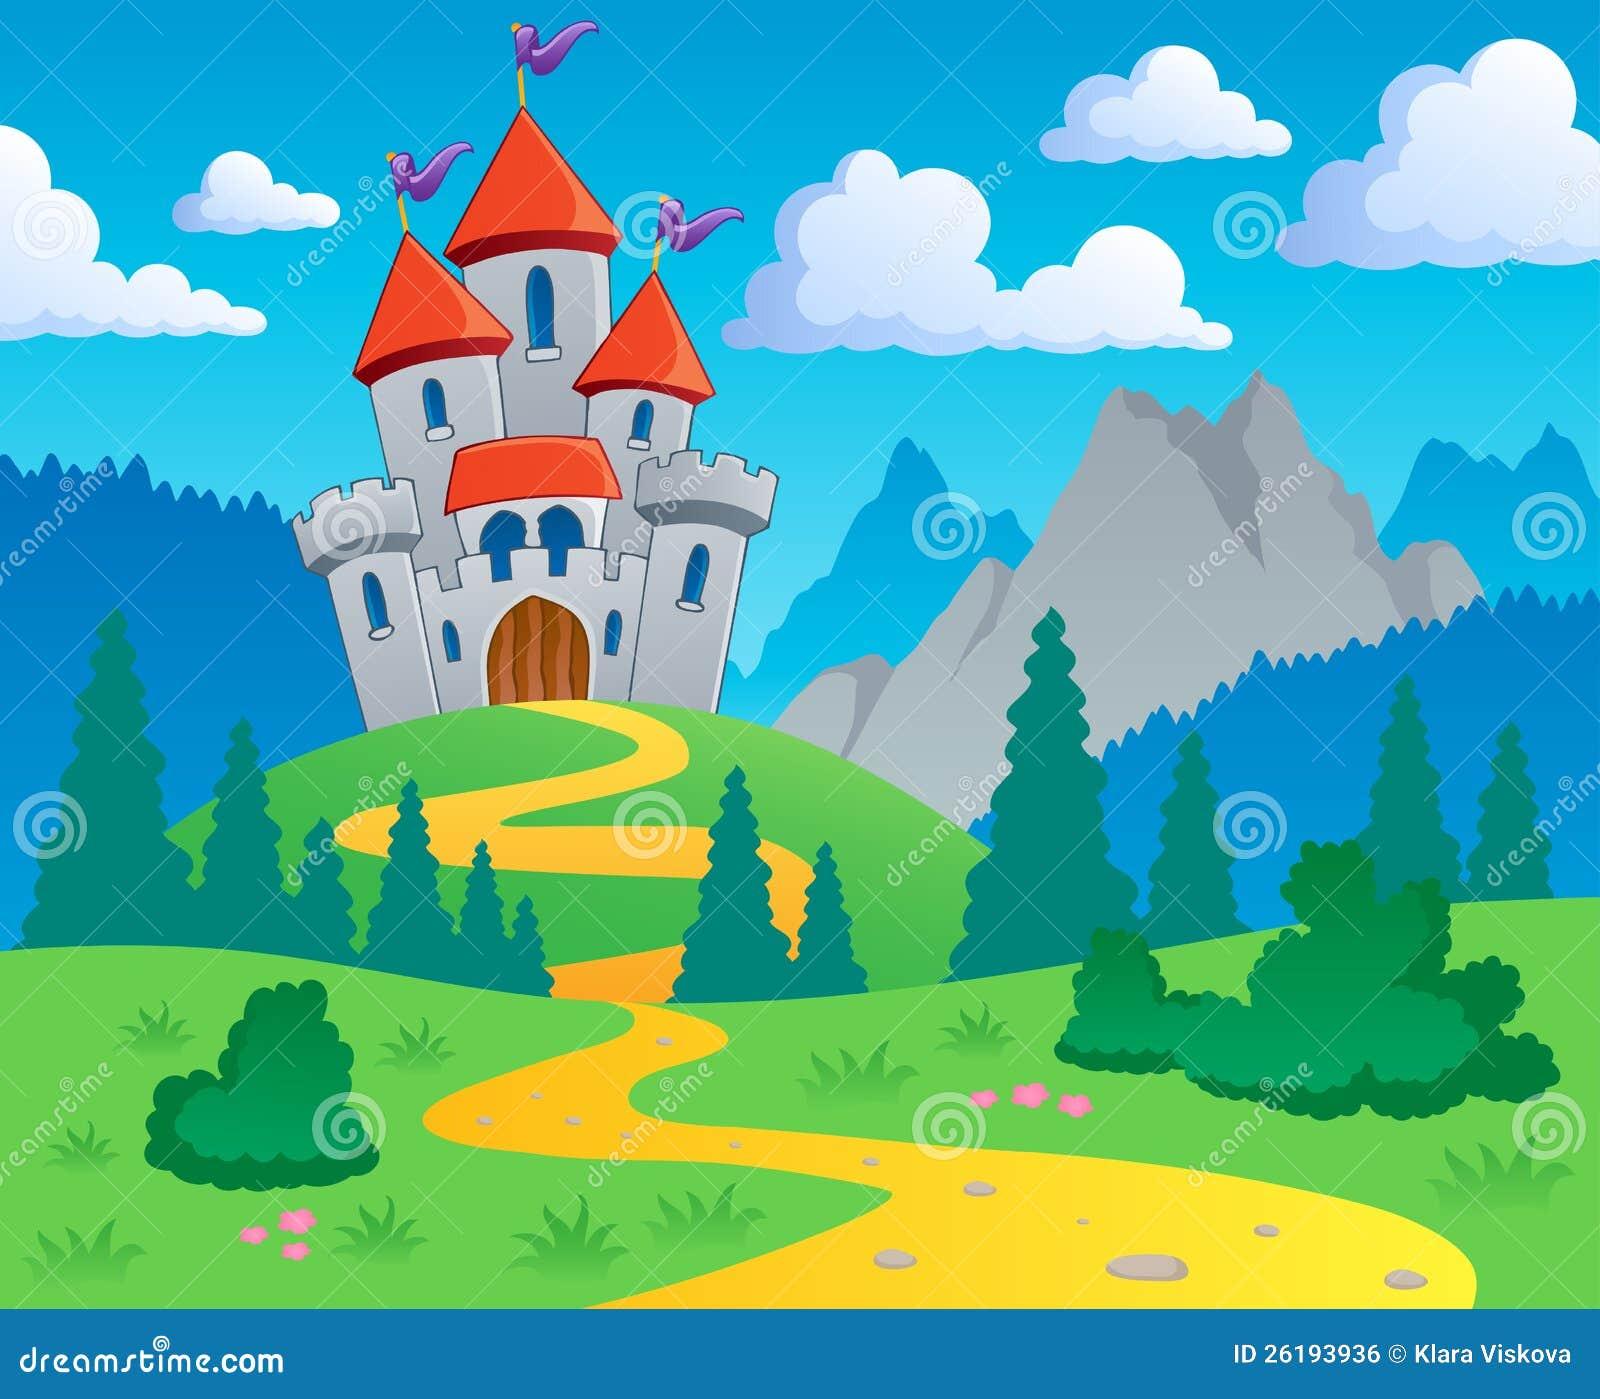 Castle Theme Landscape 1 Royalty Free Stock Image Image